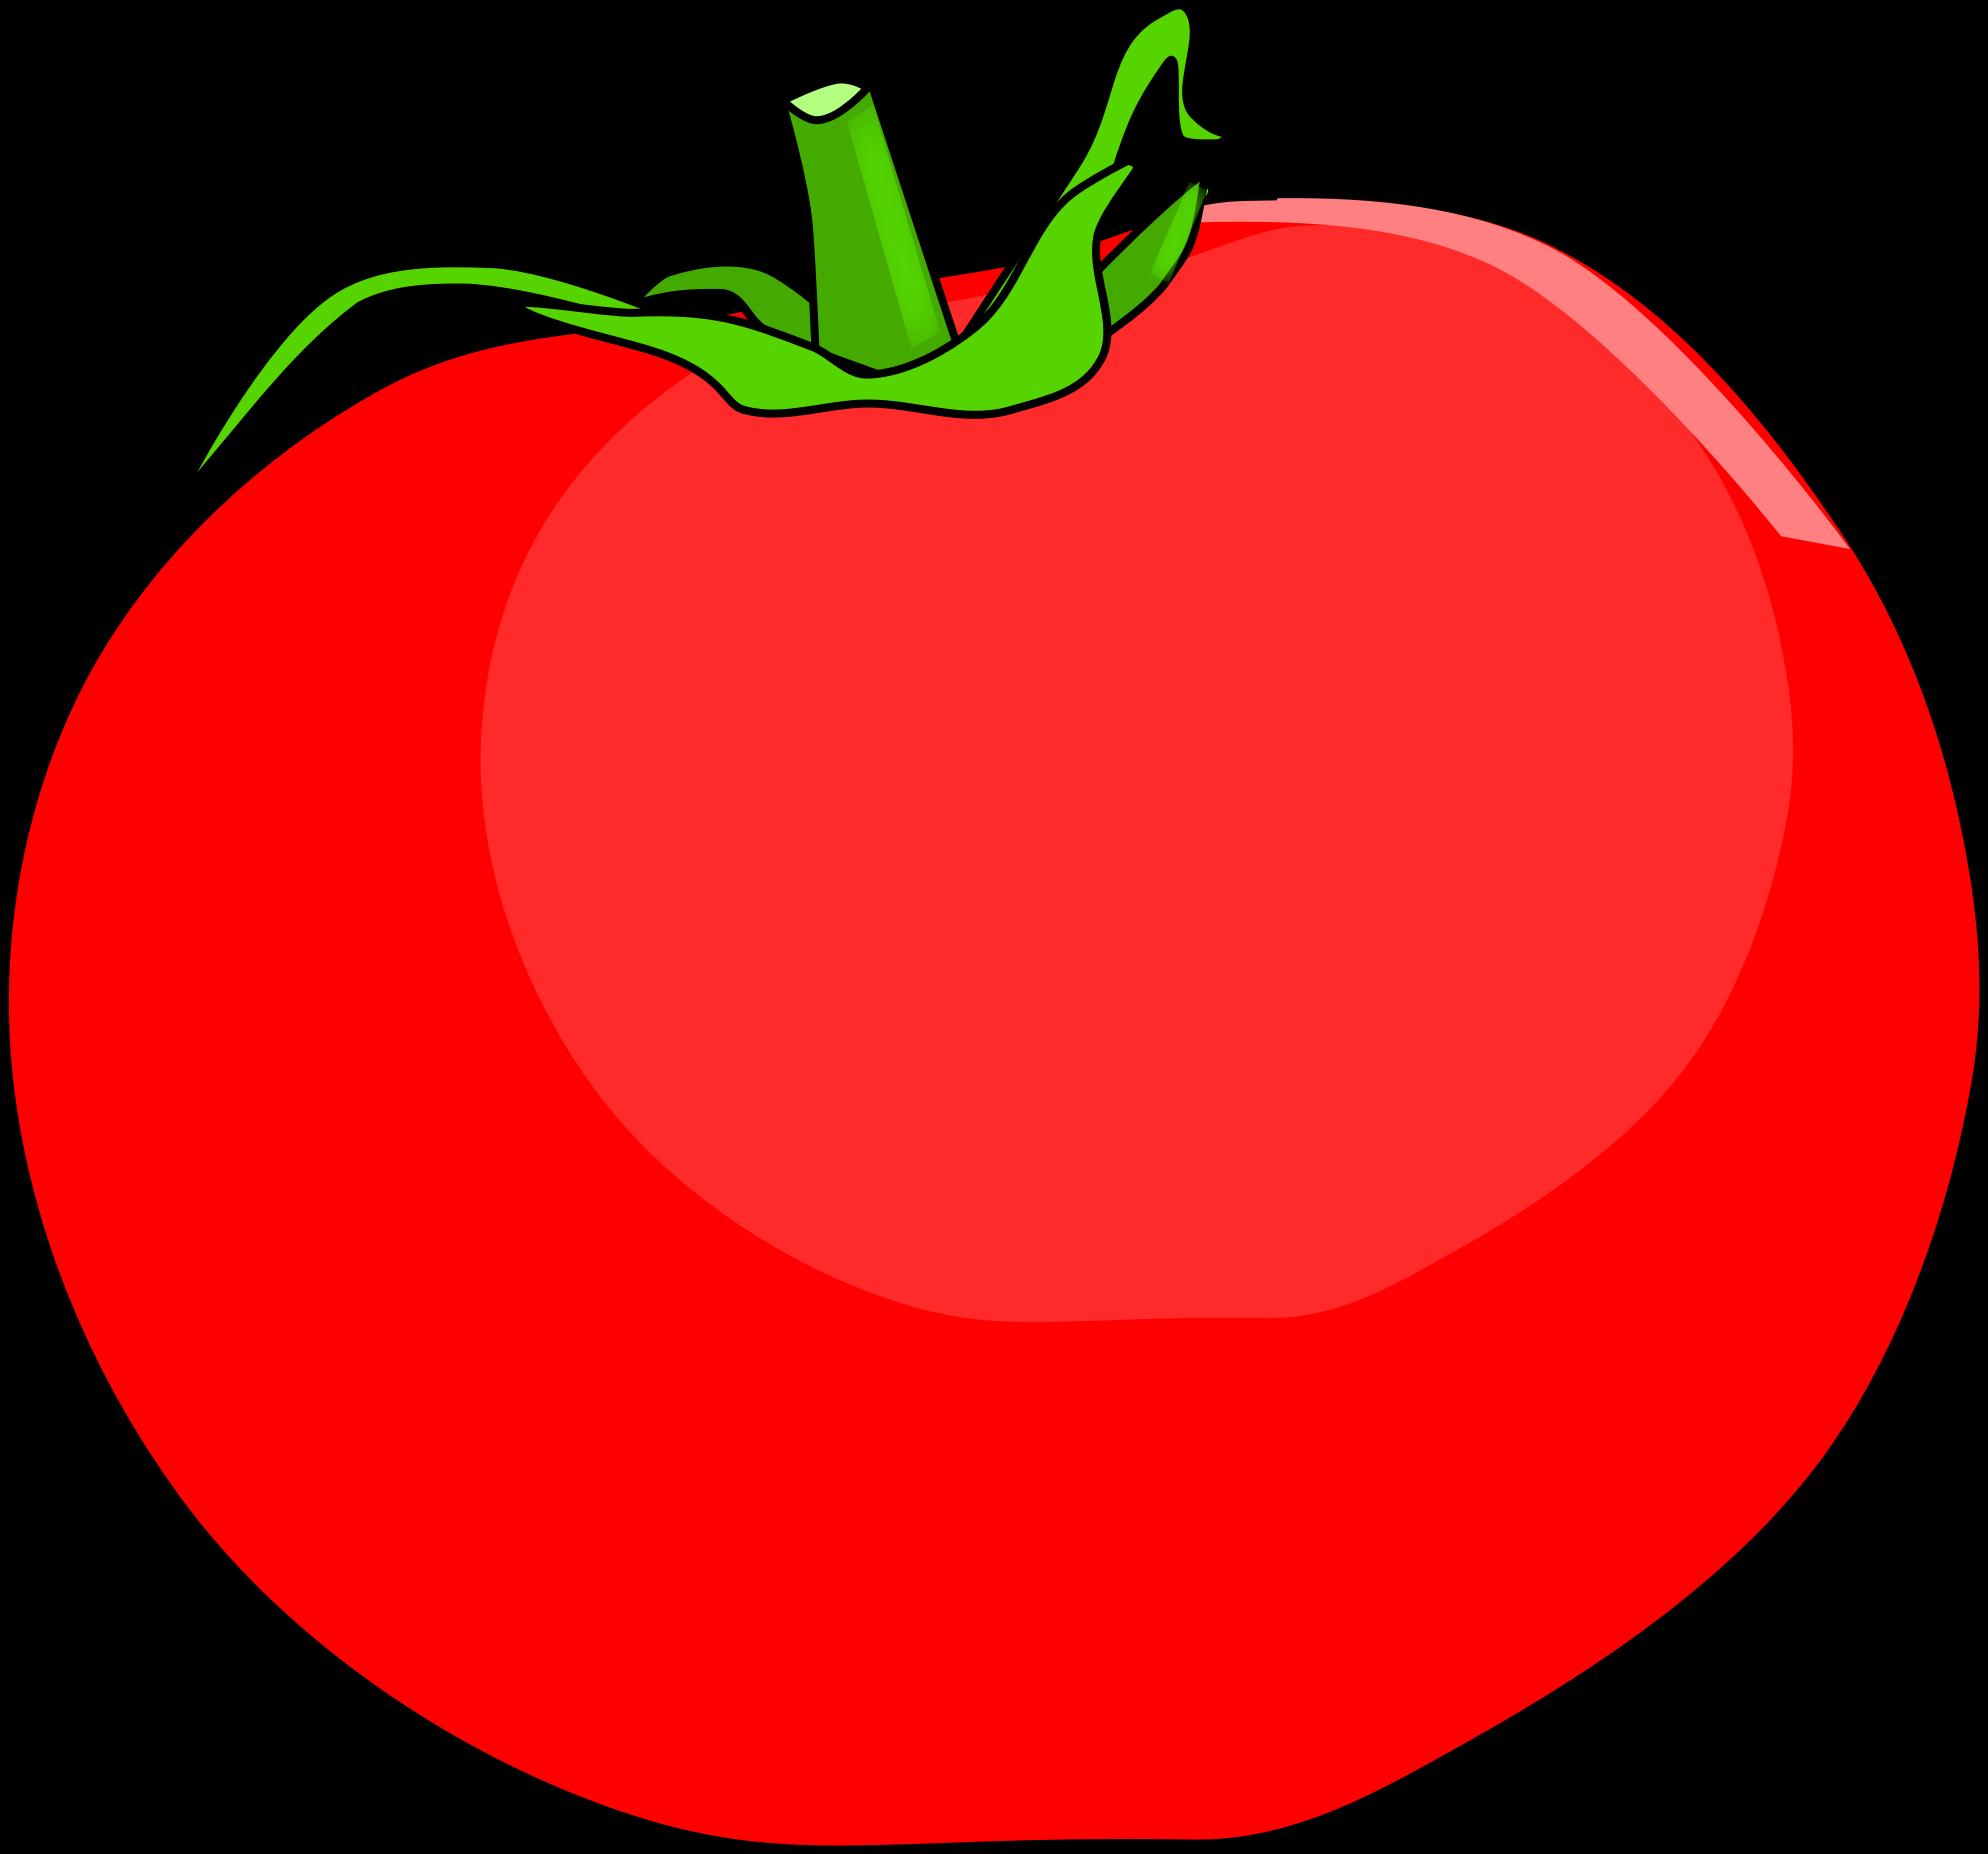 Tomato Clipart Transparent.